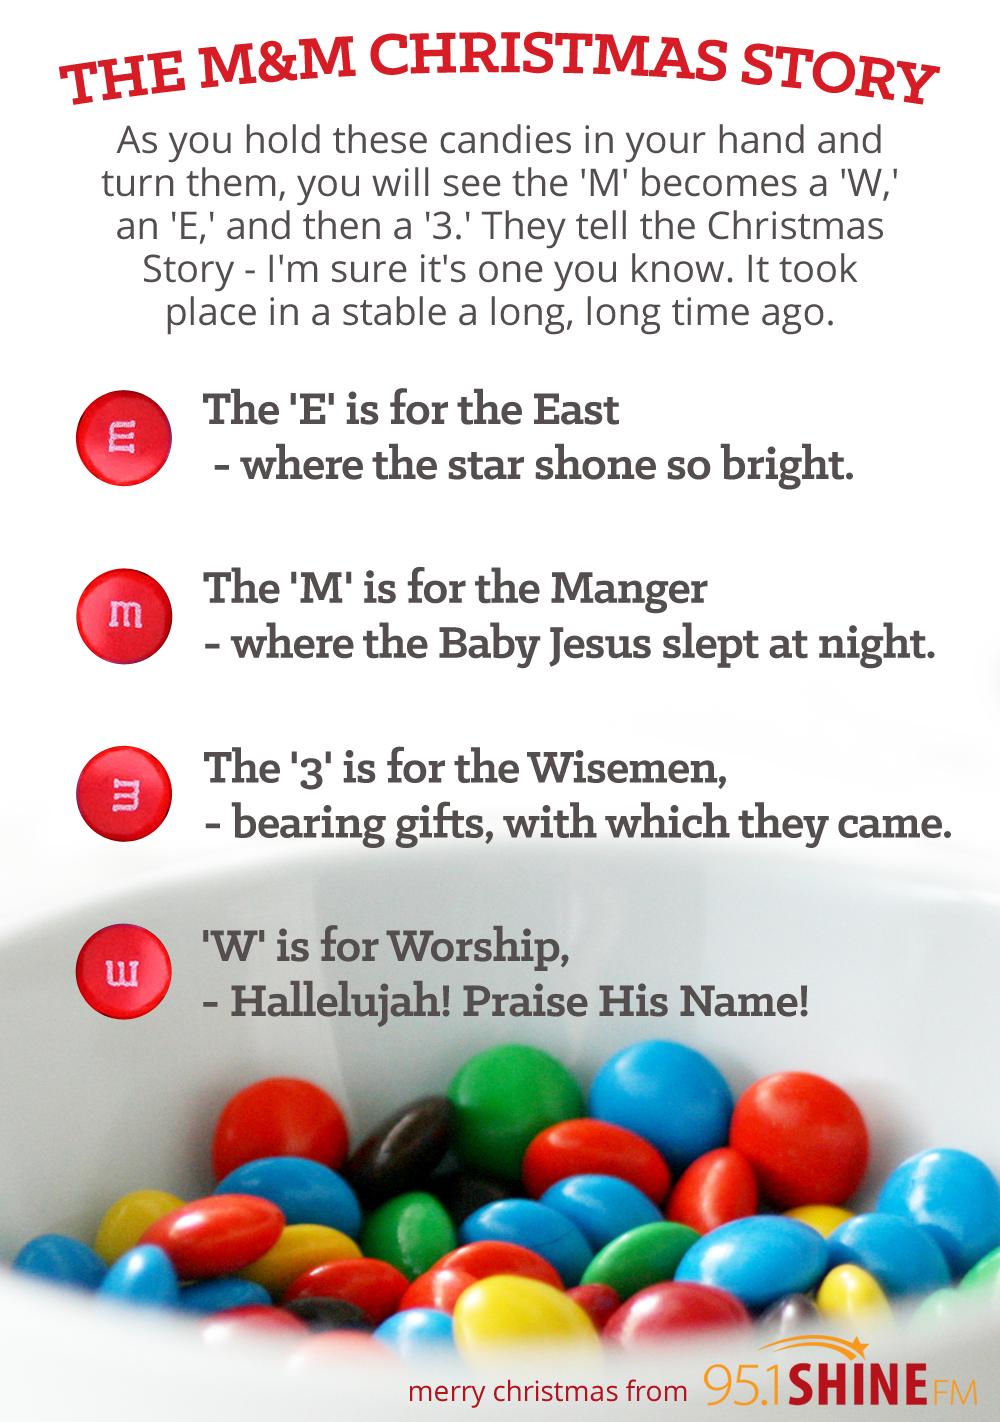 95.1 SHINE-FM: M&M Christmas Story // free printable (attach to a ...